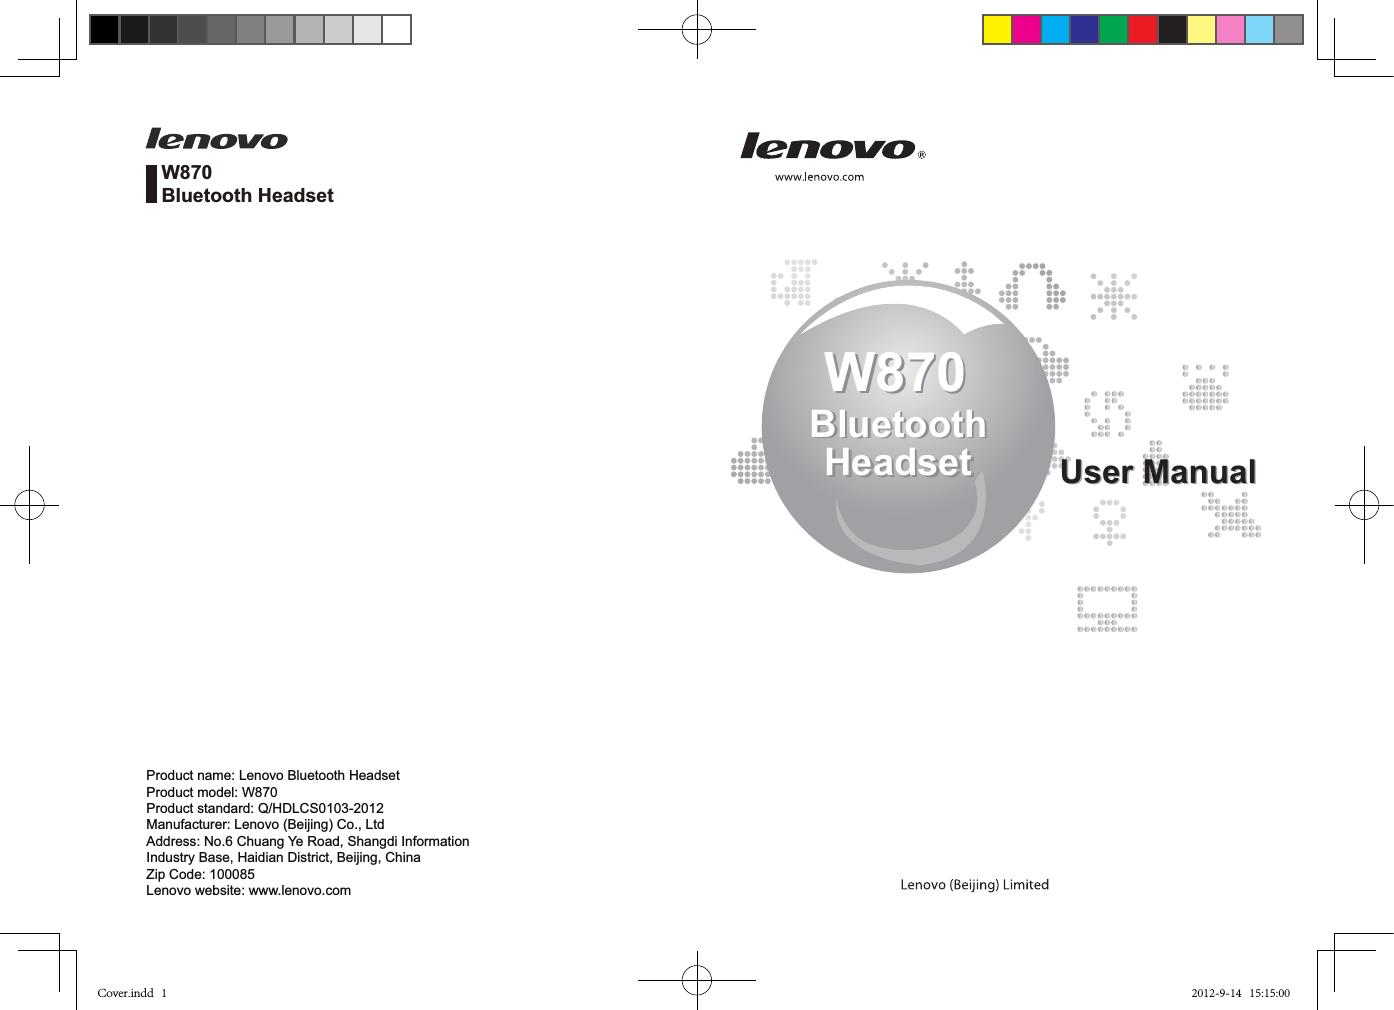 LENOVO W870 DRIVERS FOR WINDOWS VISTA